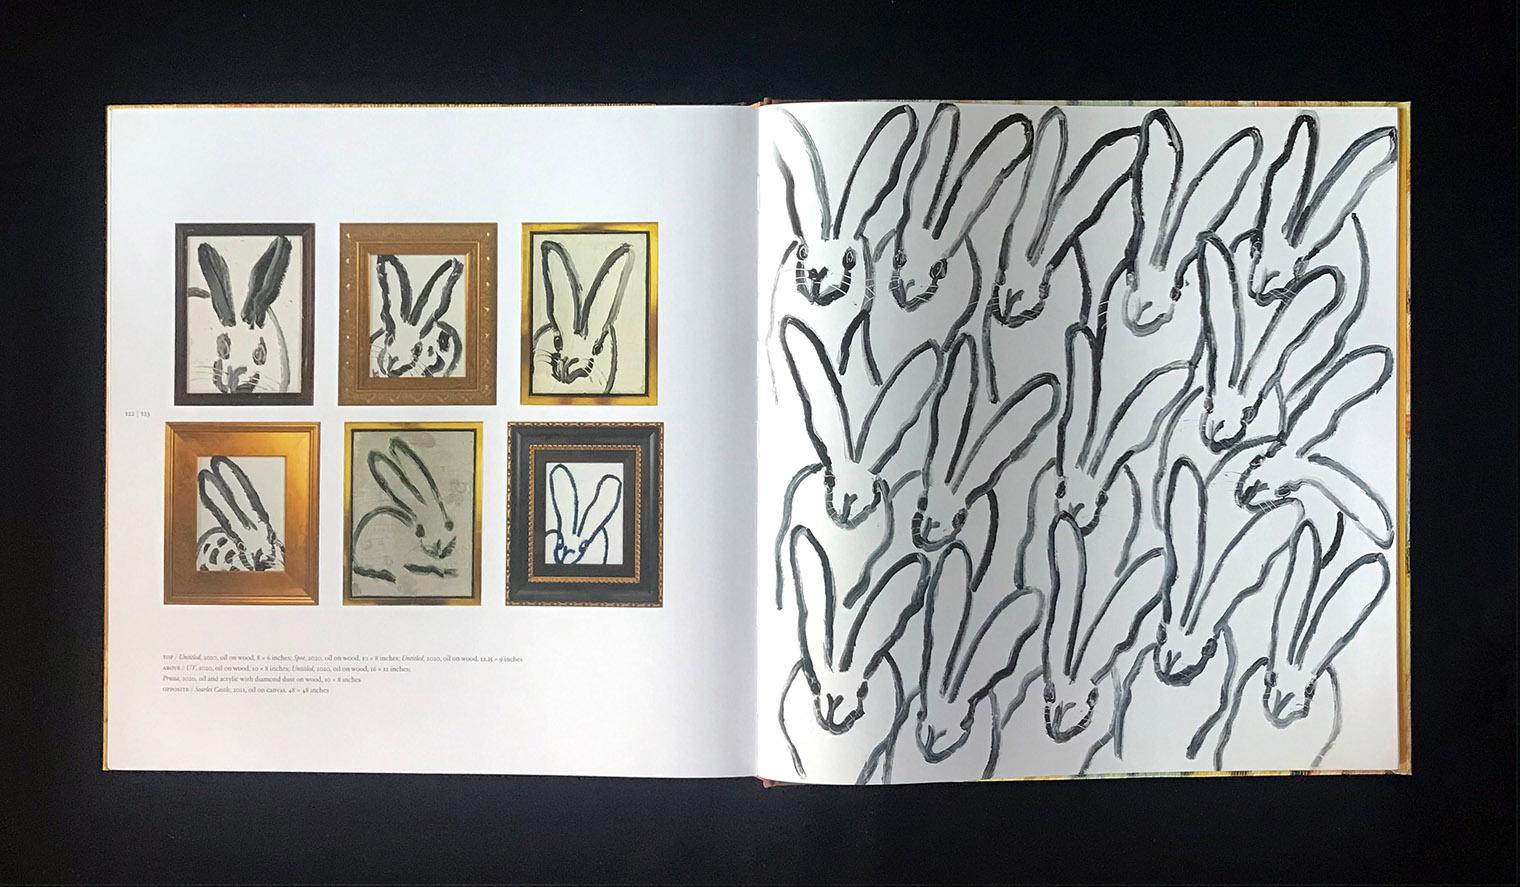 Image Spread for Hunt Slonem: The Bigger Picture Book